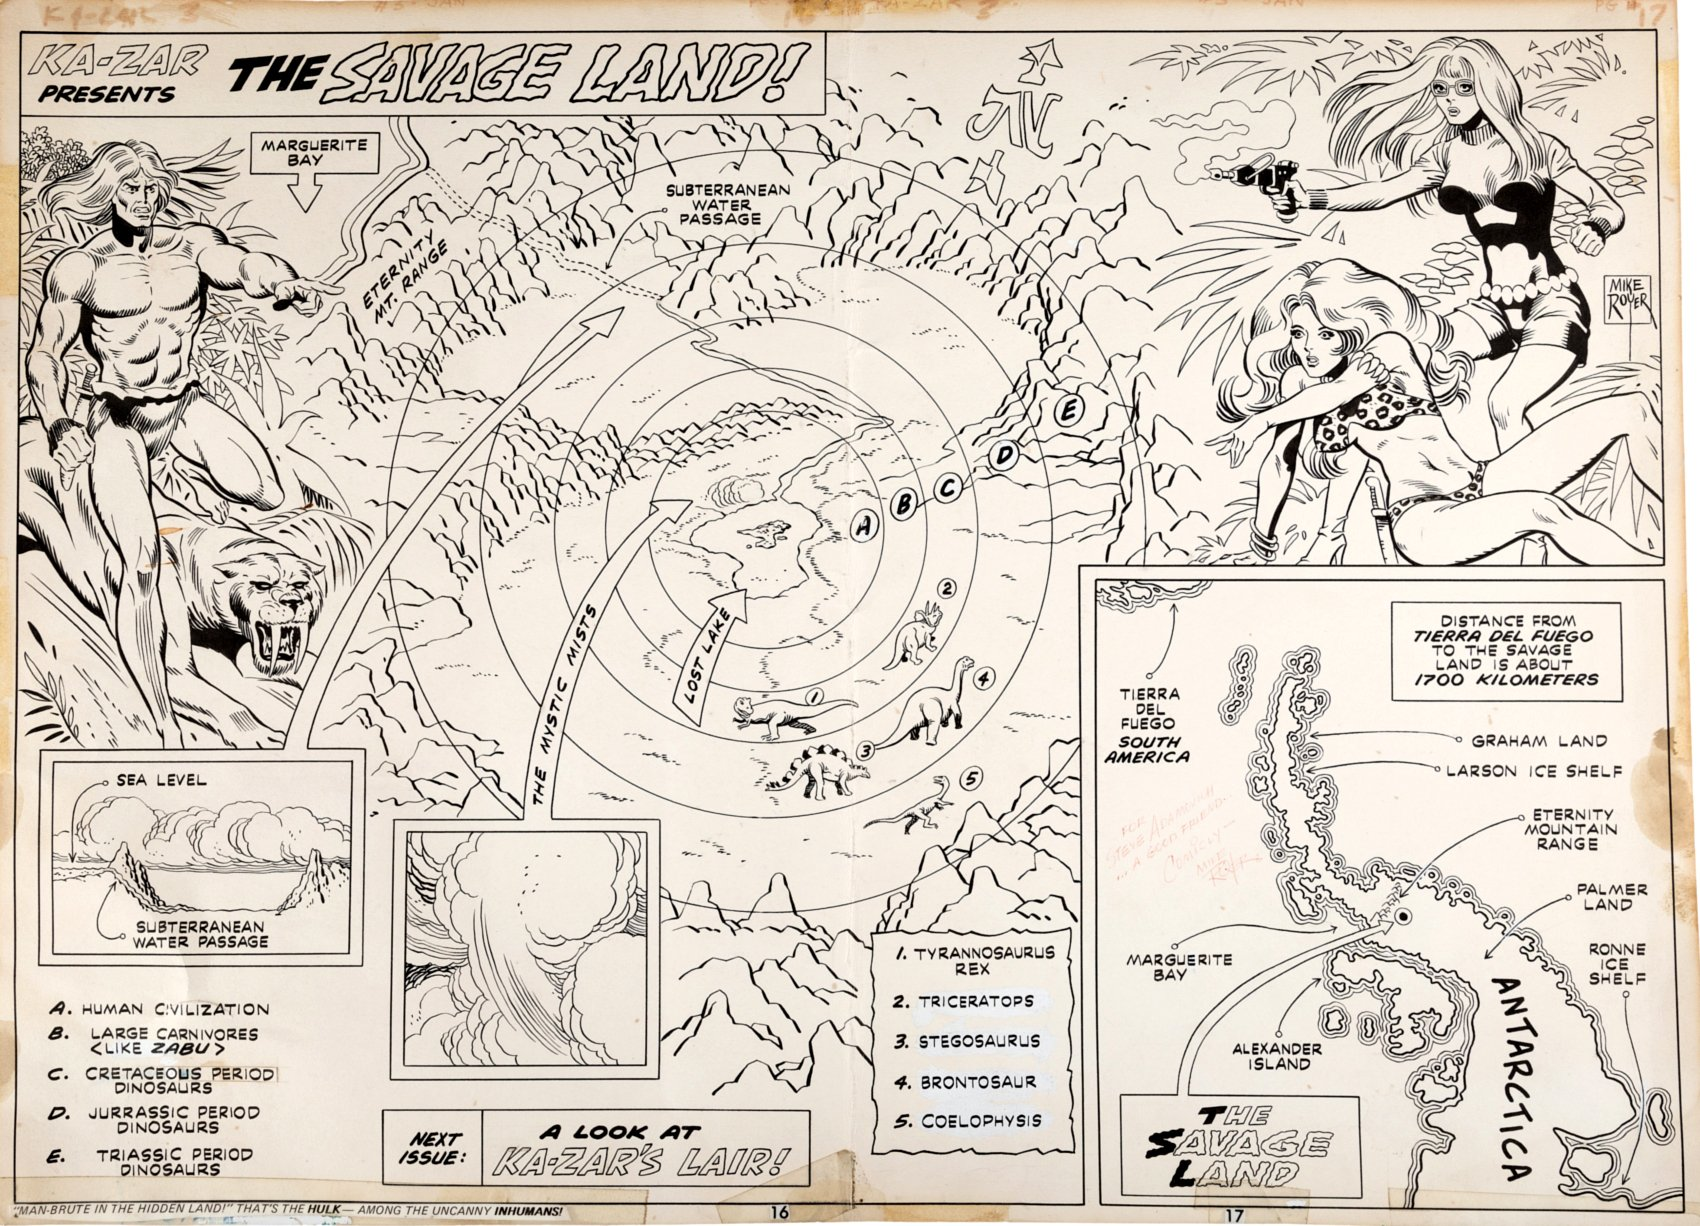 Ka-Zar #3 p 16-17 (Double Page Splash On 1 Large Board, KA-ZAR, ZABU, SHEENA, MOCKINGBIRD!) 1974